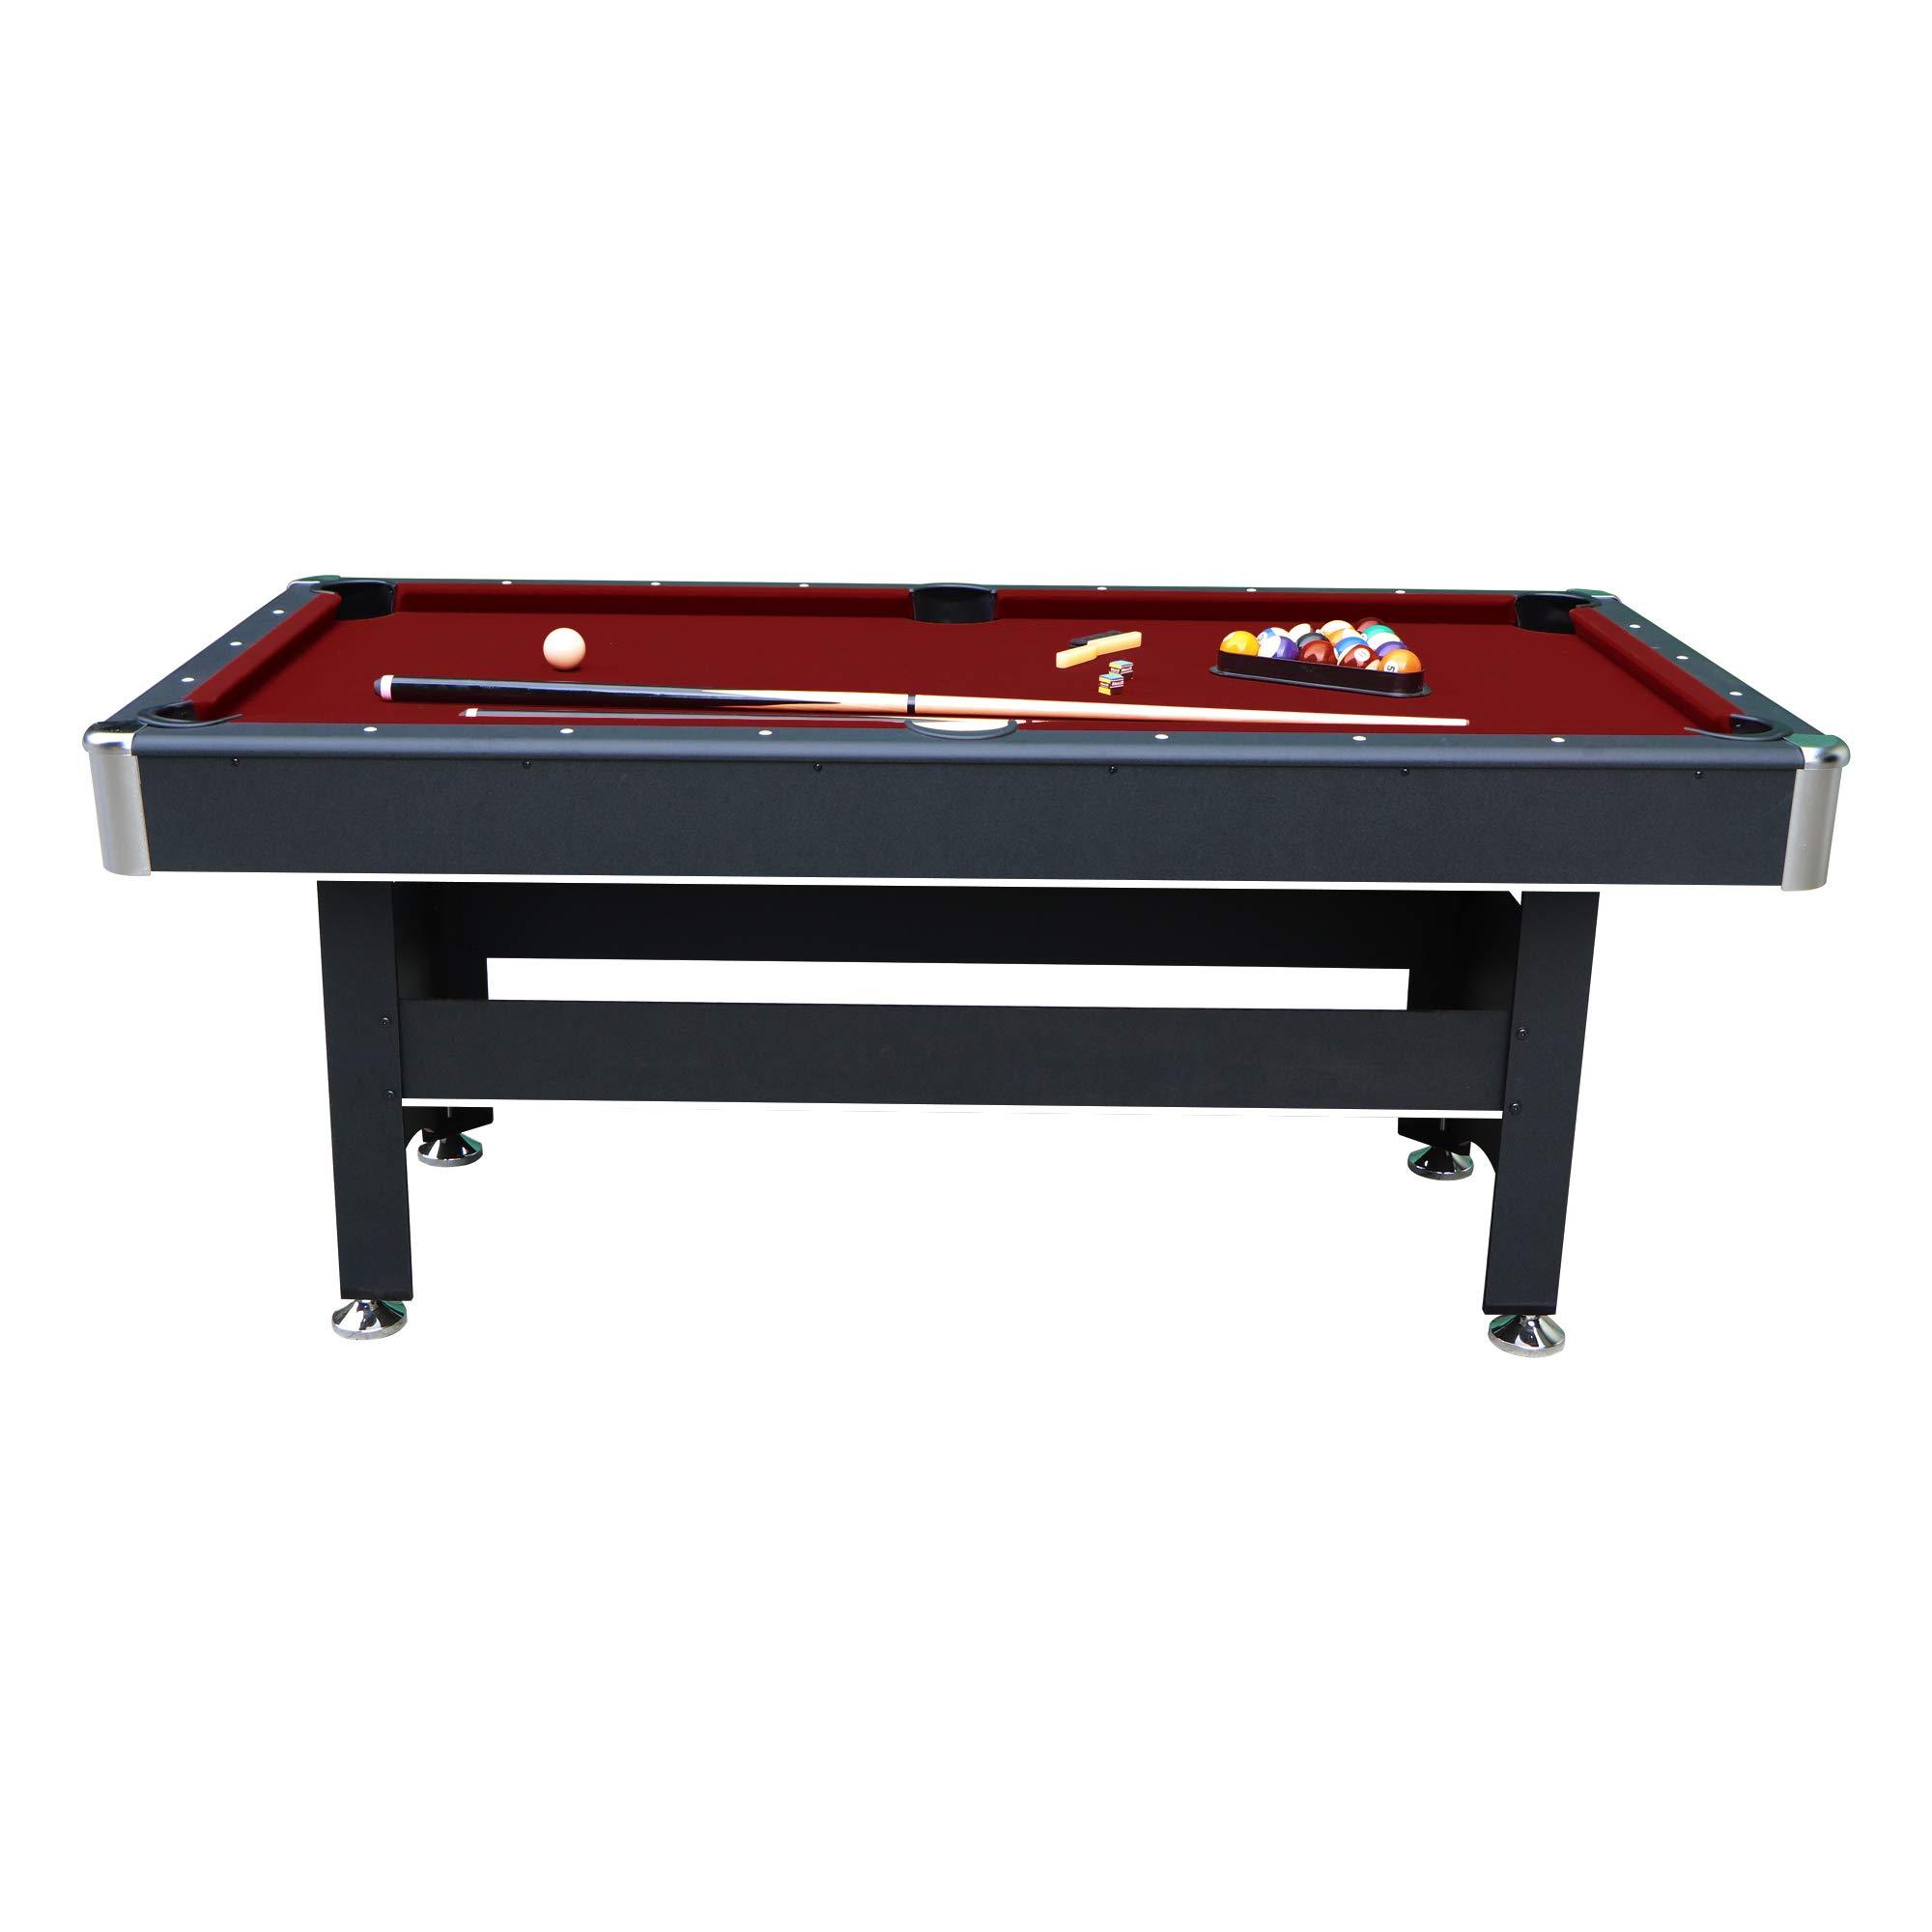 Hathaway Conquest Red Fiberglass Cue Pool Billiard Stick Indoor Game 58 In New